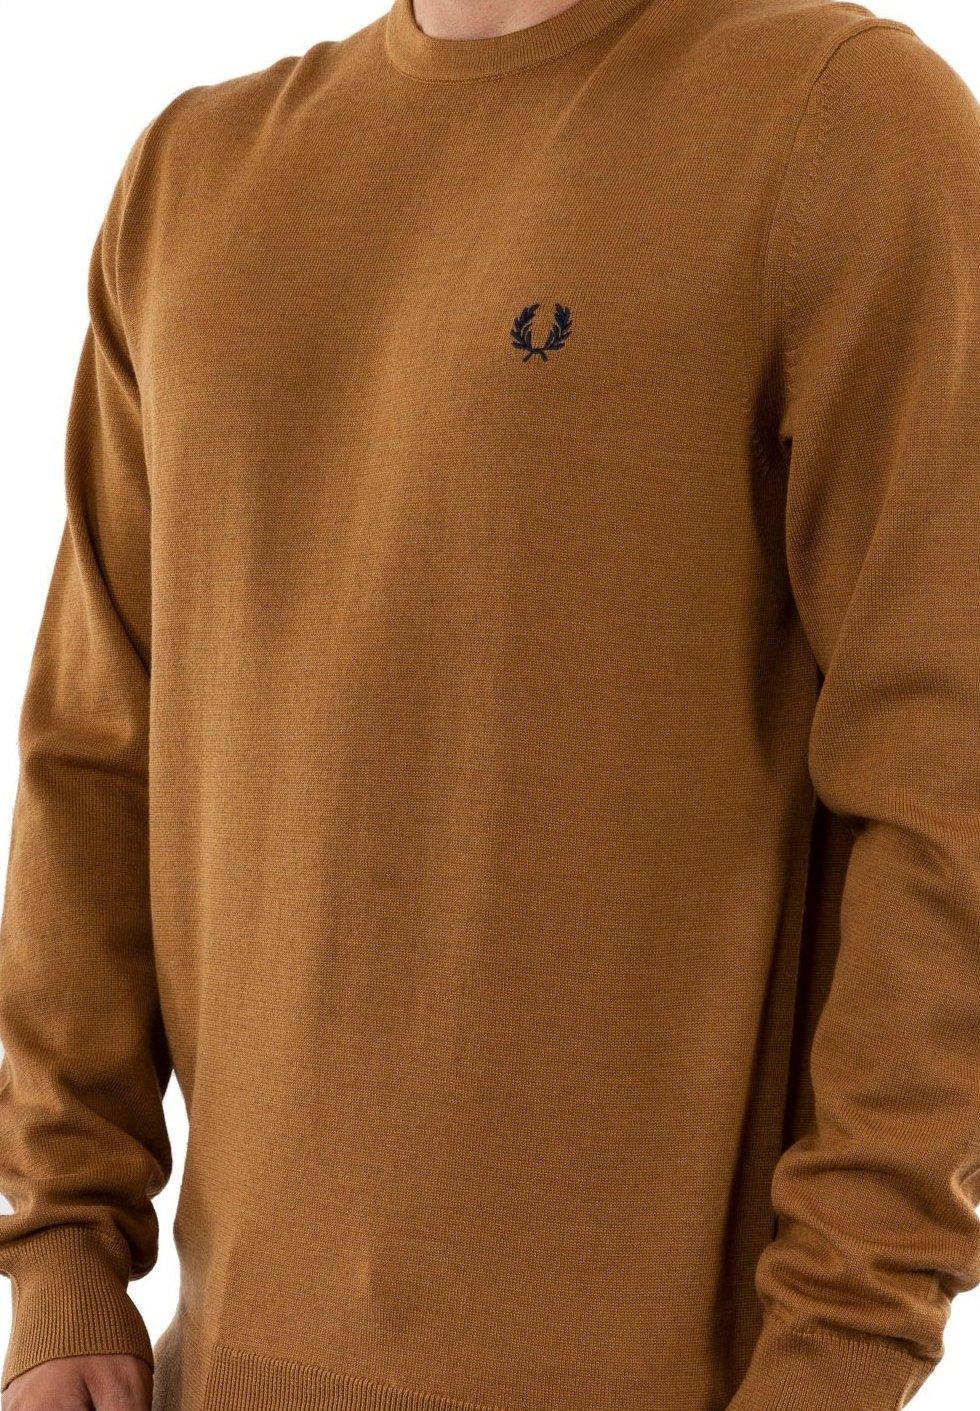 Fred Perry Sweatshirt - beige